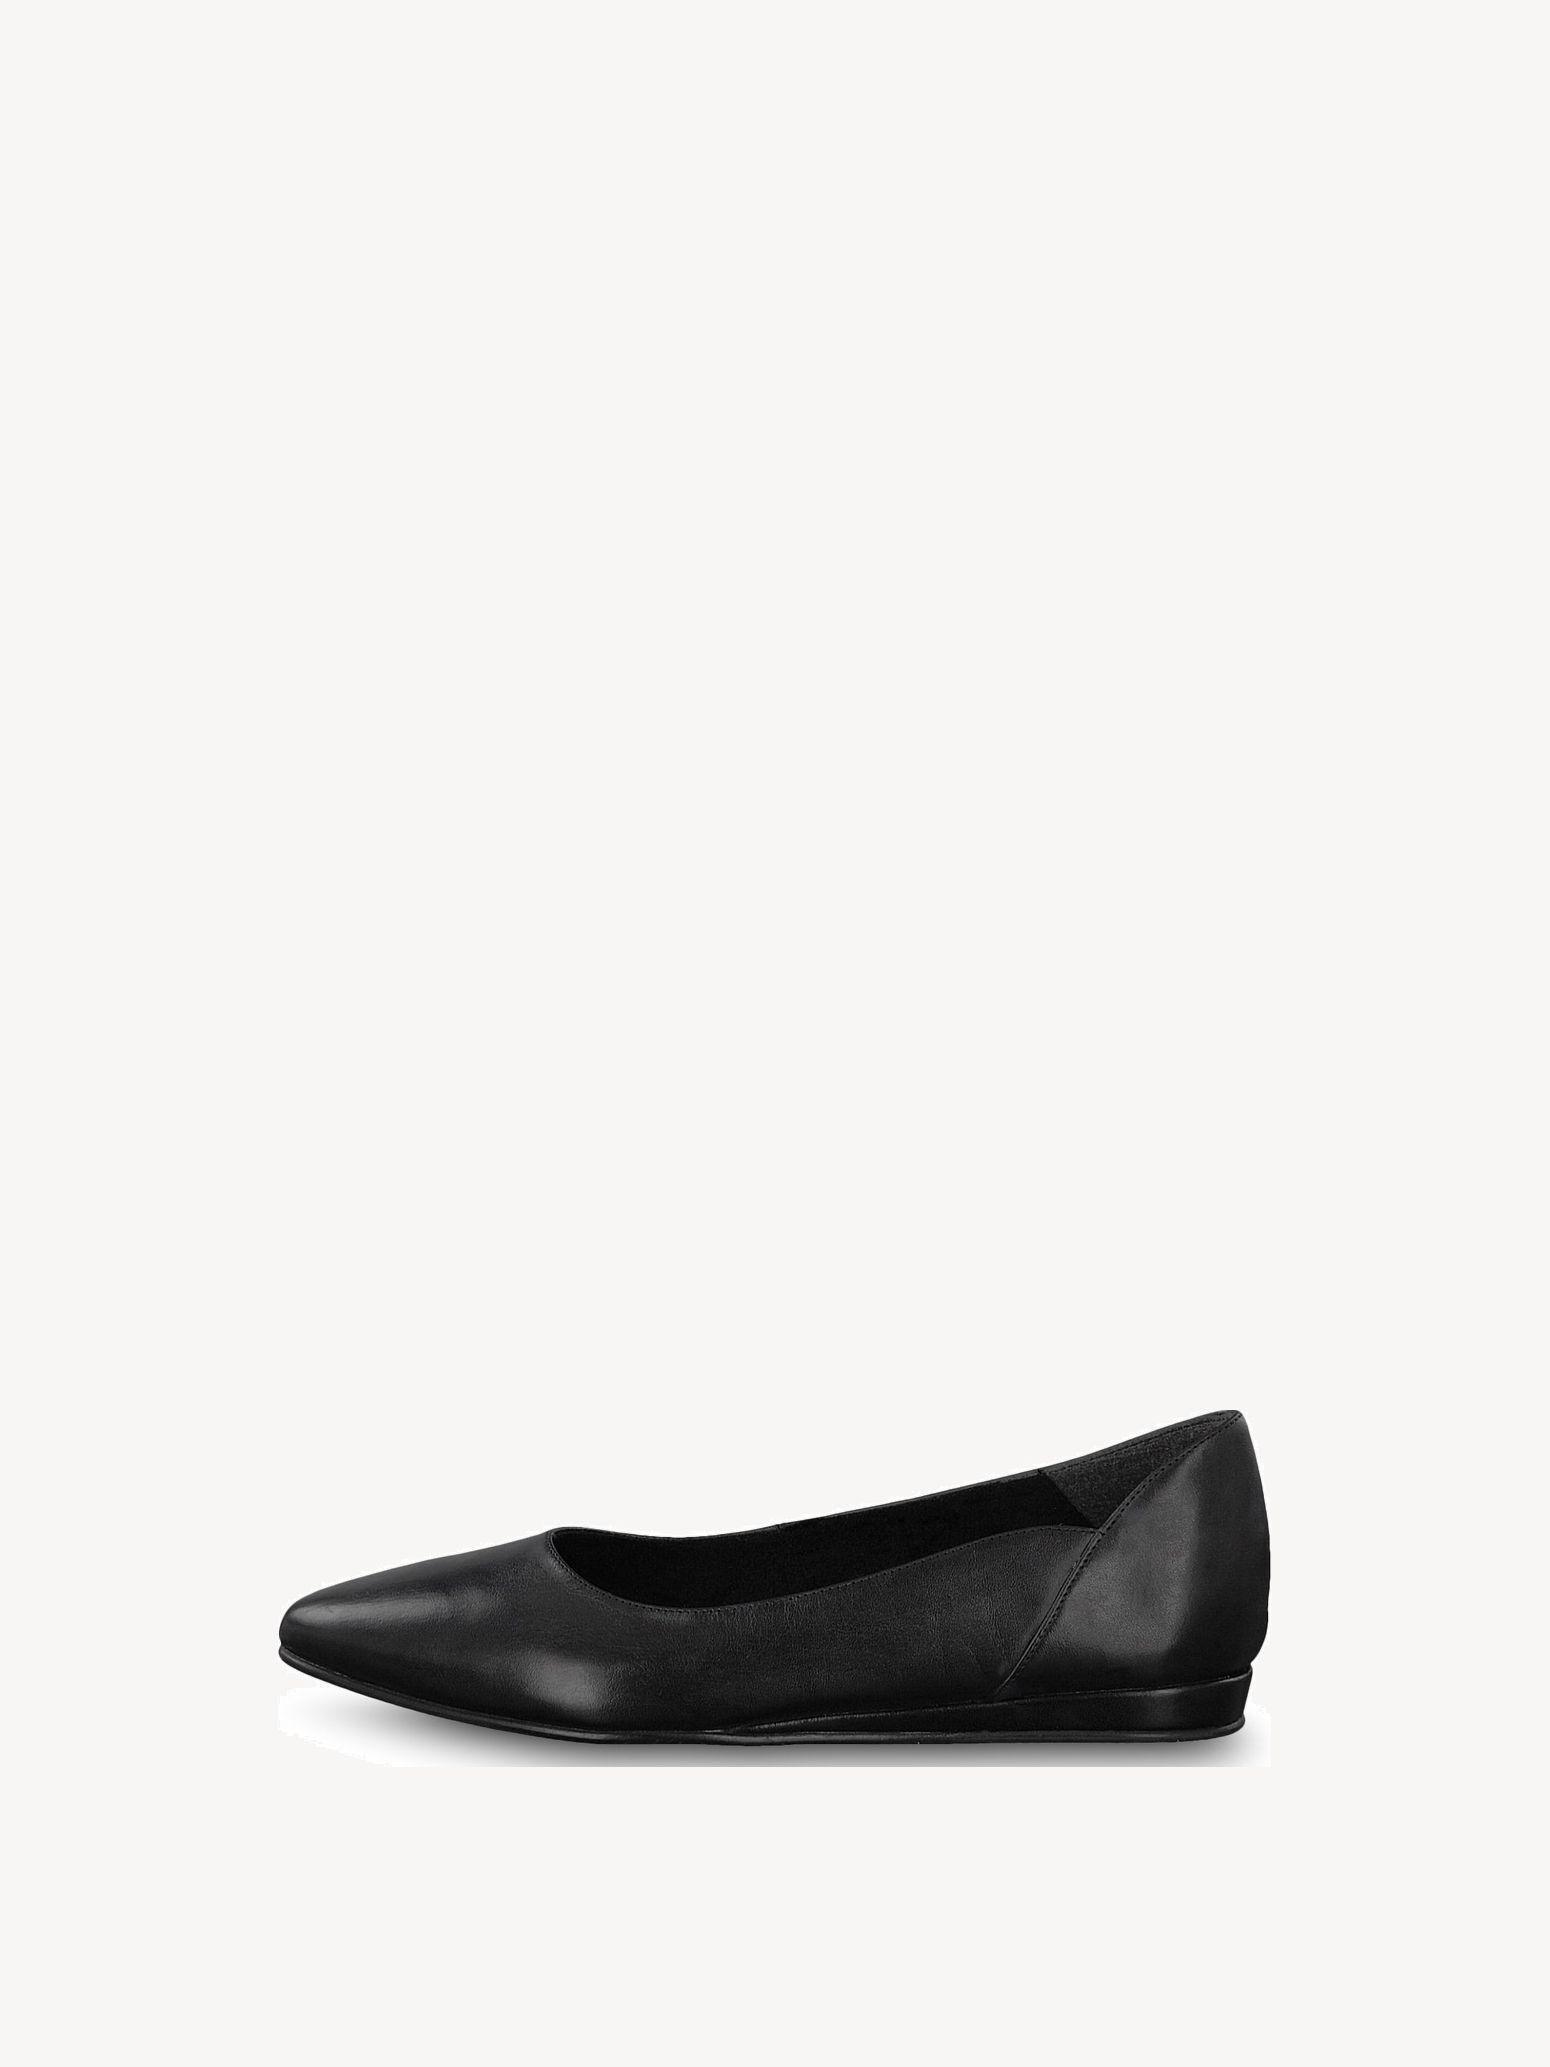 Tamaris Ballerinas Gr.40 schwarz Leder